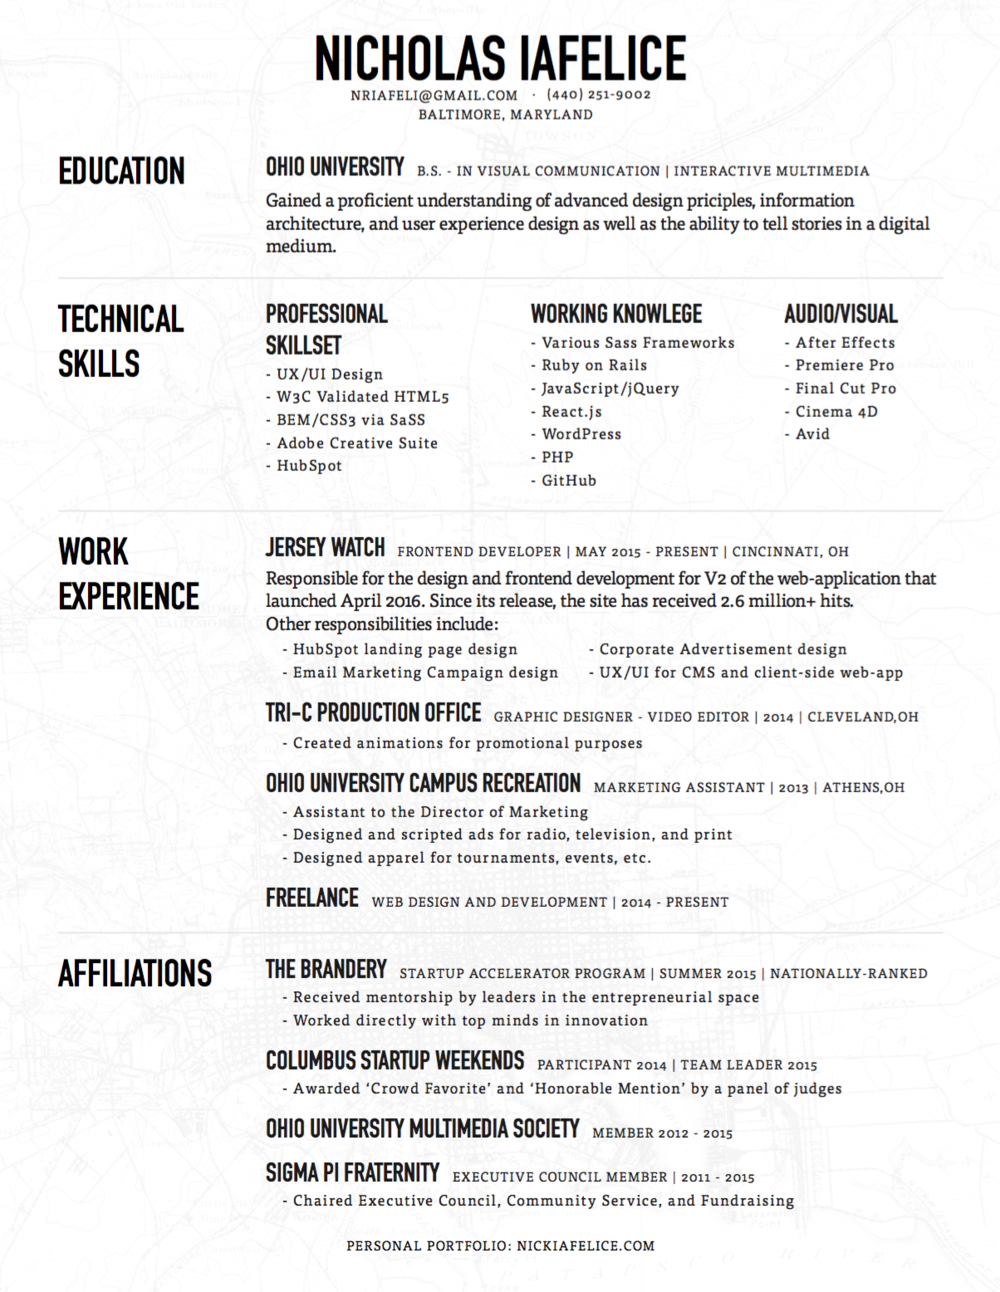 Resume Writing Services Dallas Excel Resume  Nicholas Iafelice Curriculum Vitae Resume Pdf with Resume Builders Pdf Resume Administrative Assistant Duties Resume Pdf